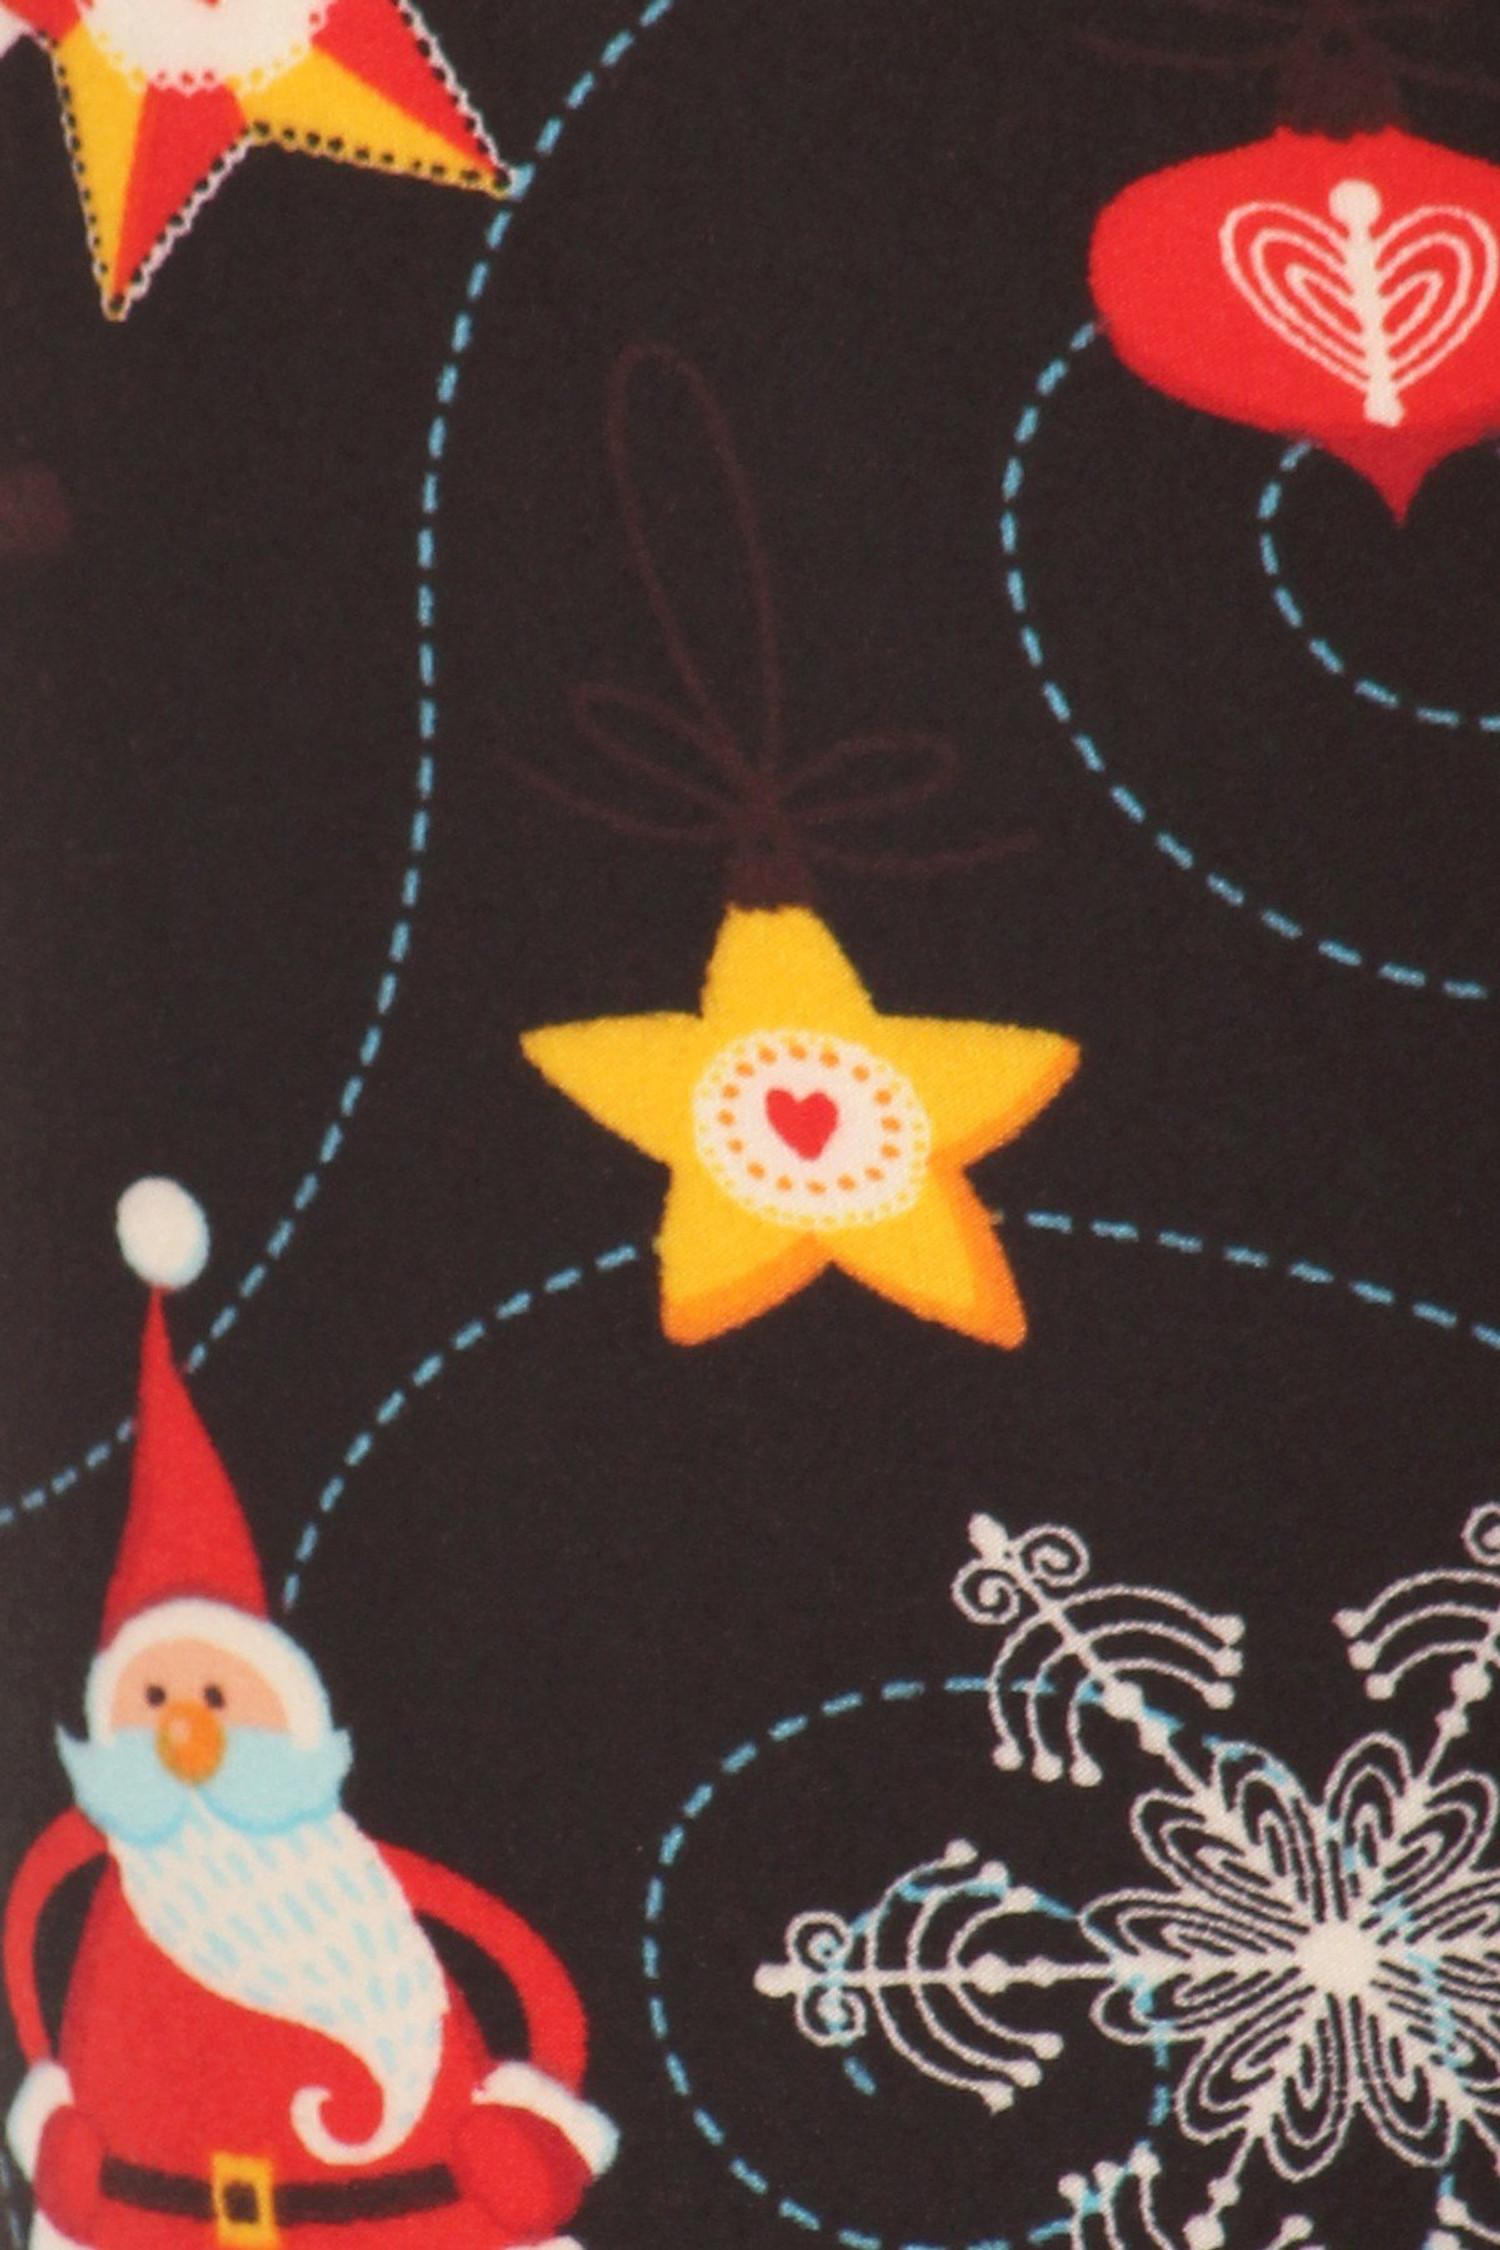 Brushed Santa's Wonderland Christmas Plus Size Leggings